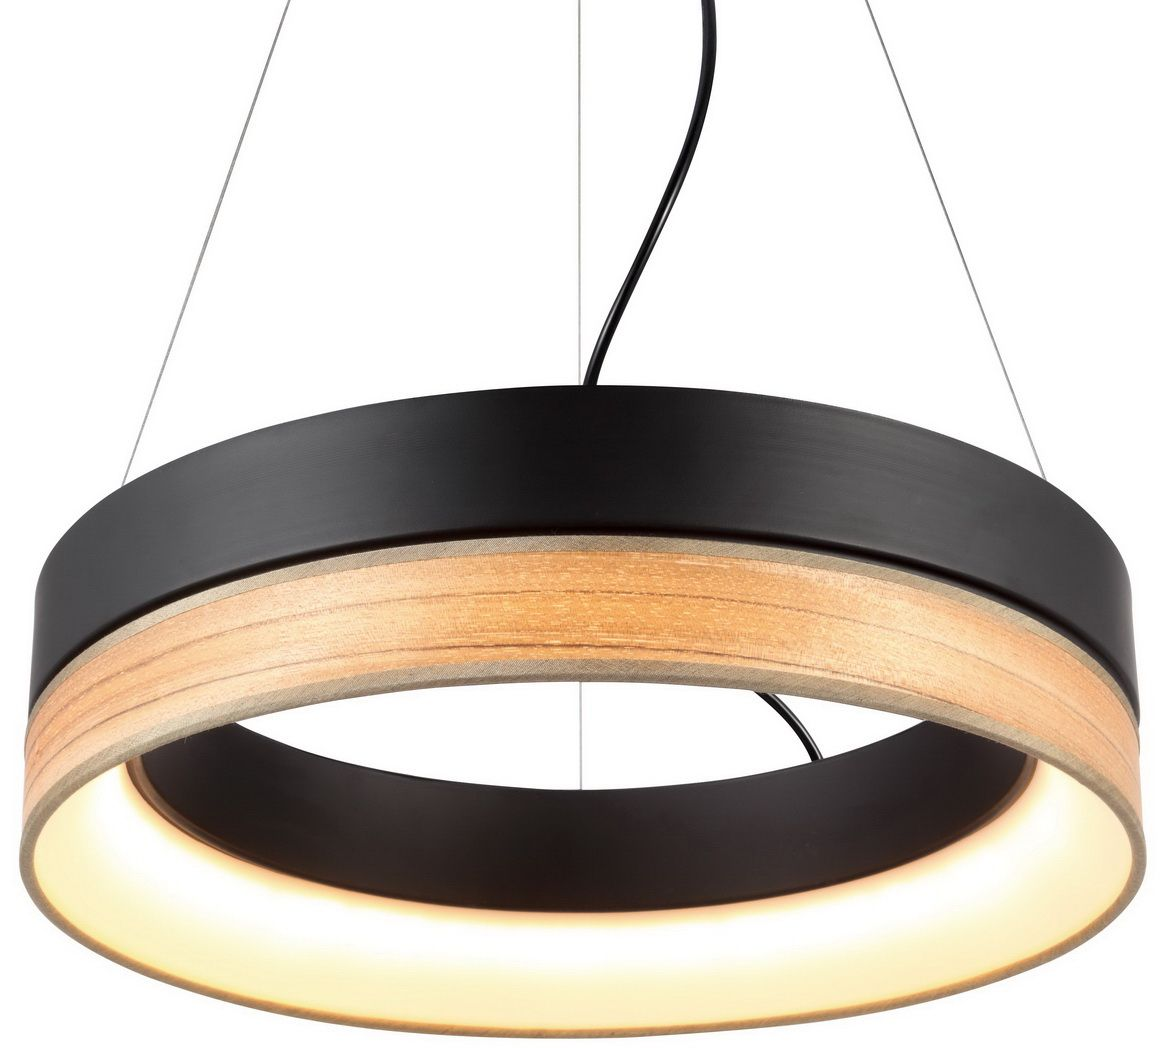 Светильник подвесной Favourite Ledino, 1 х LED, 43. 1358-120P1358-120P